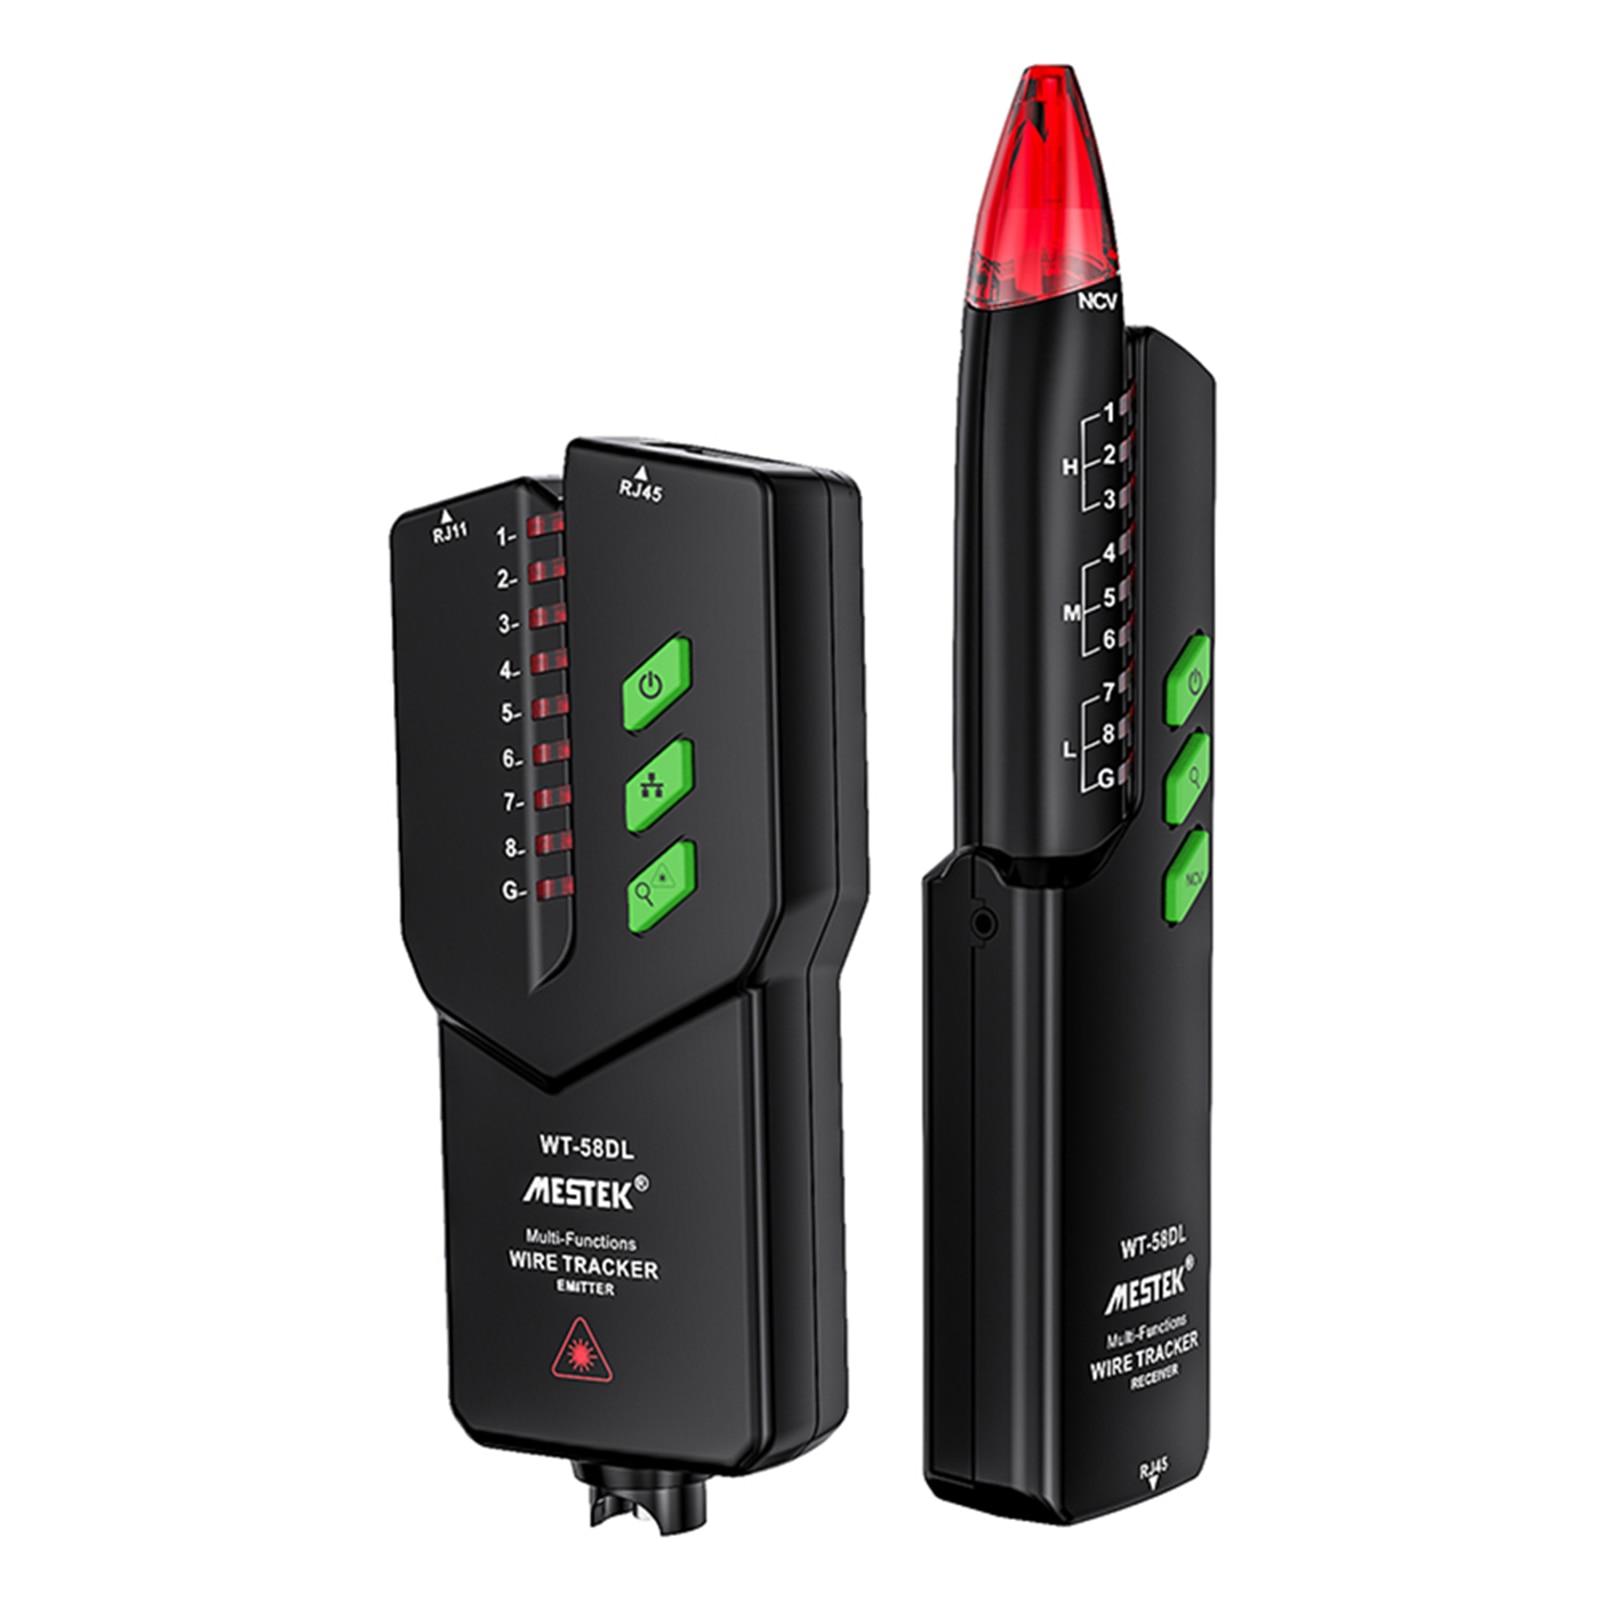 WT-58DL Tester de Cable de red de Cable rastreador de línea de...